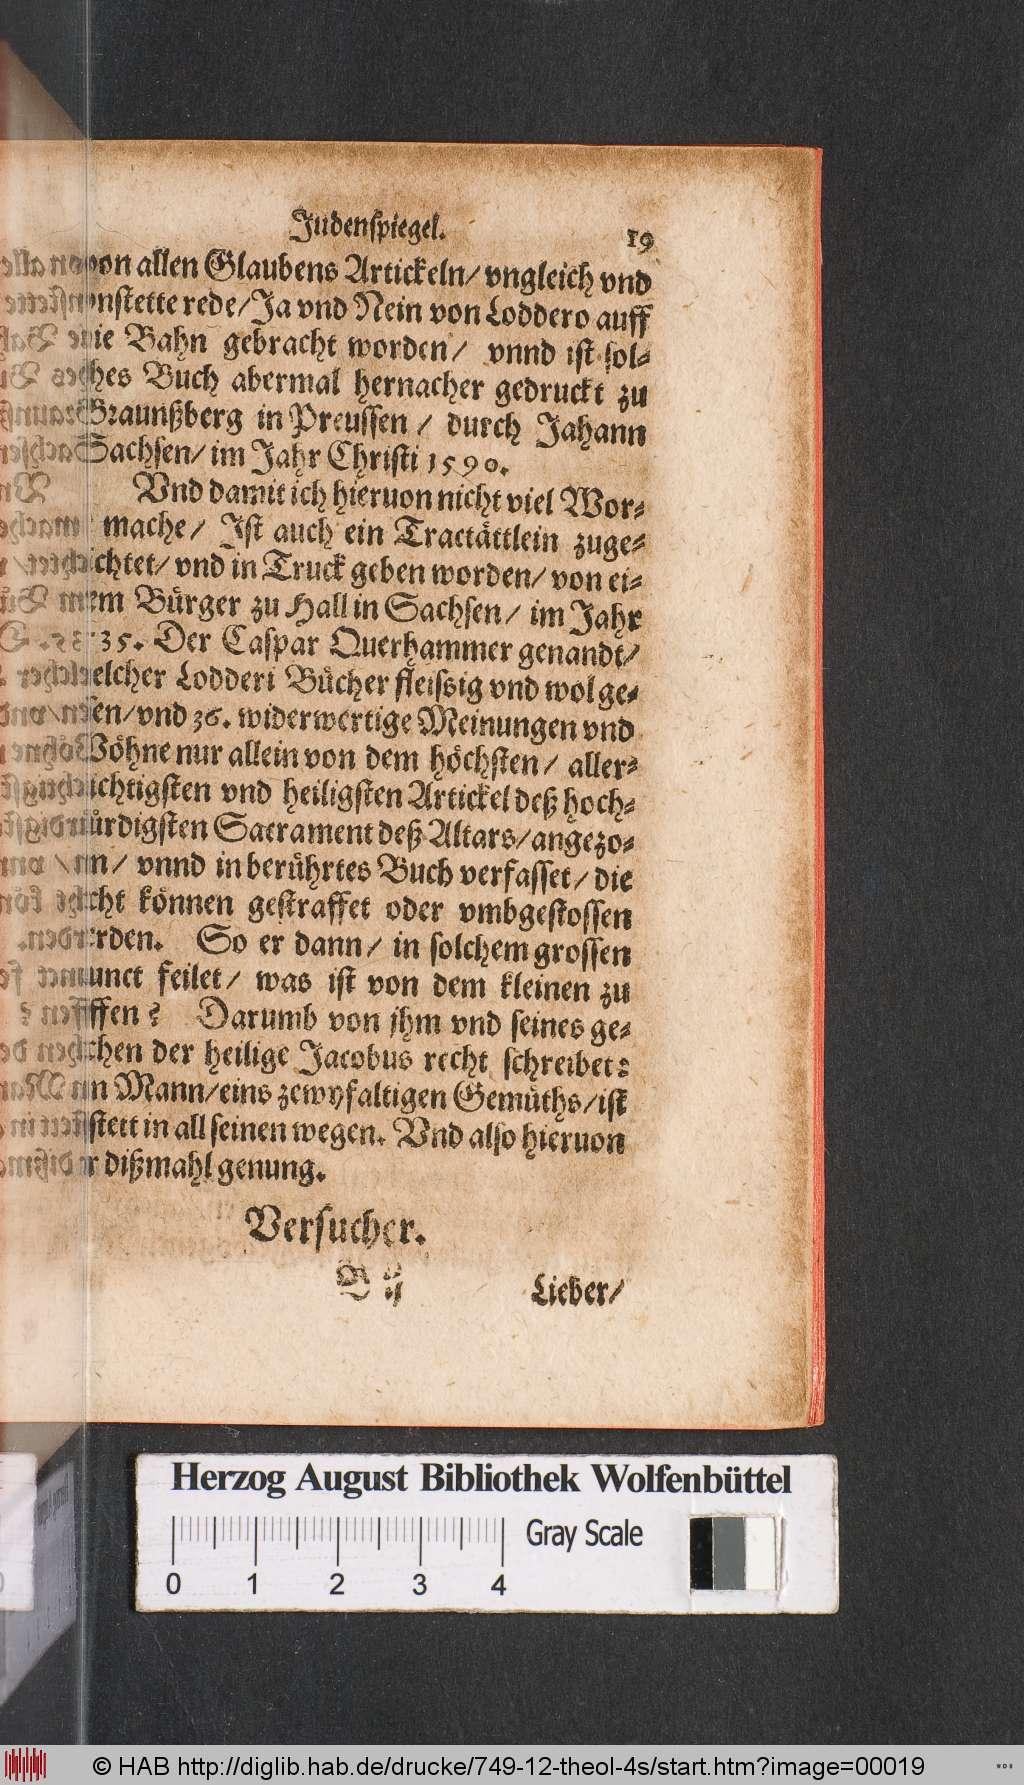 http://diglib.hab.de/drucke/749-12-theol-4s/00019.jpg